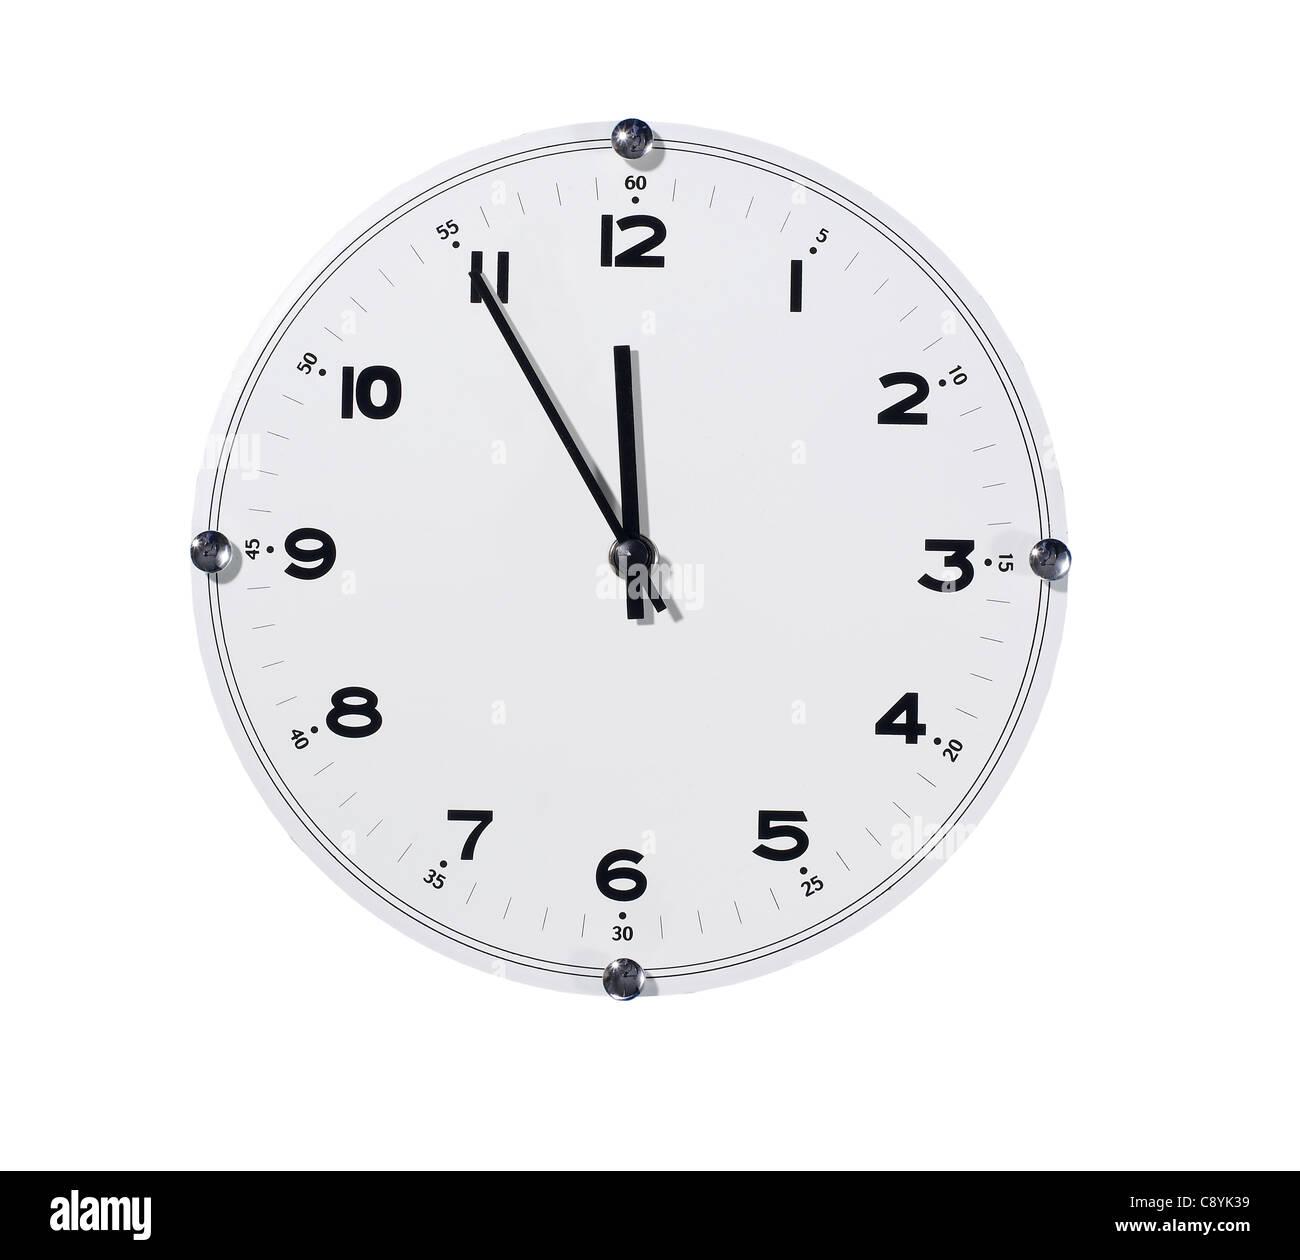 Horloge murale Photo Stock